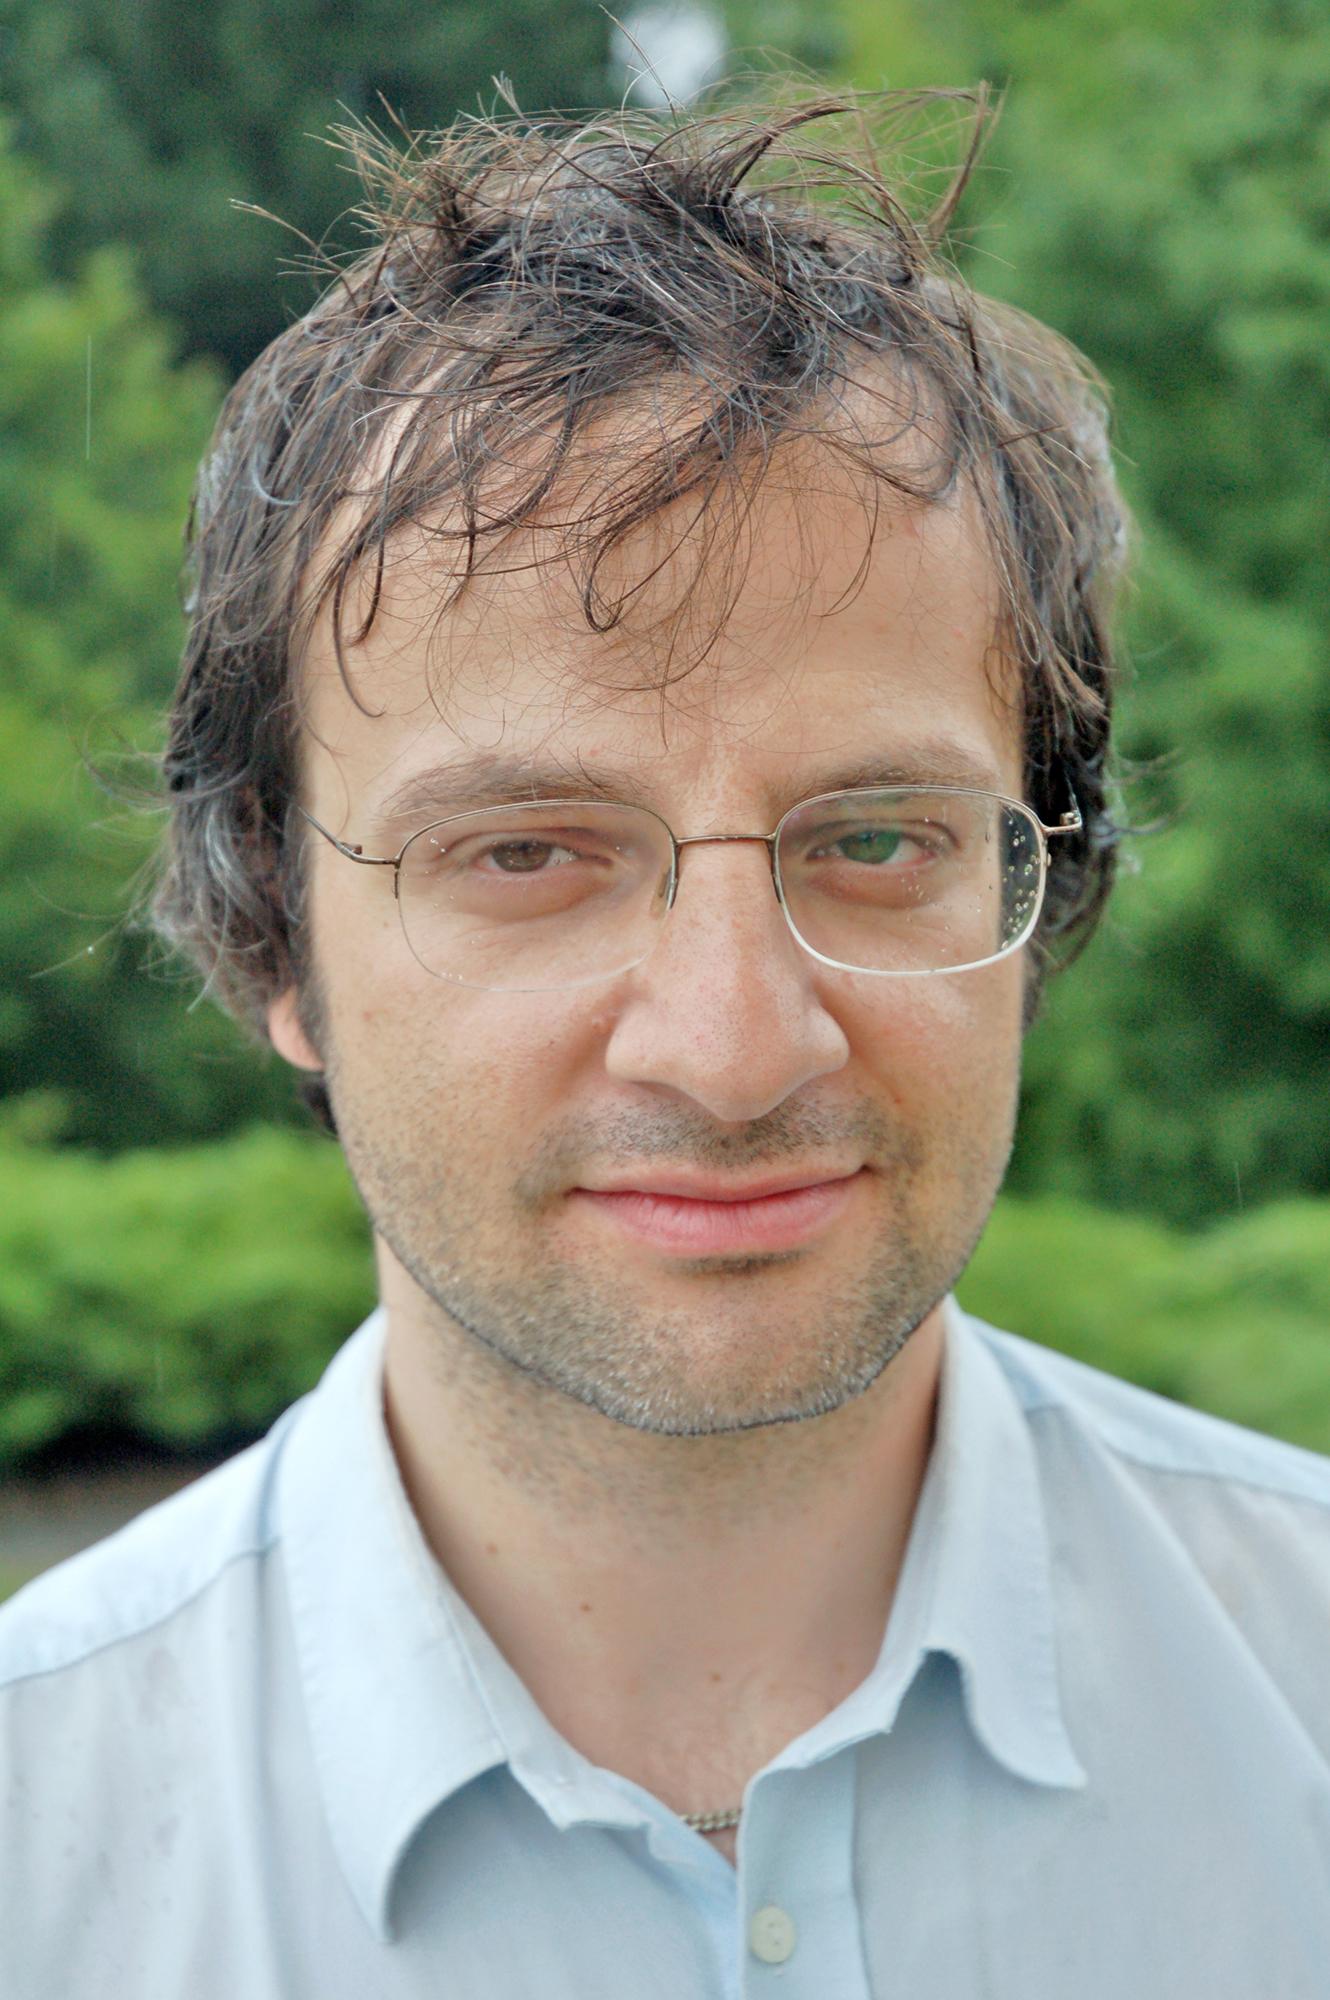 Serhat Karakayali - researcher, author